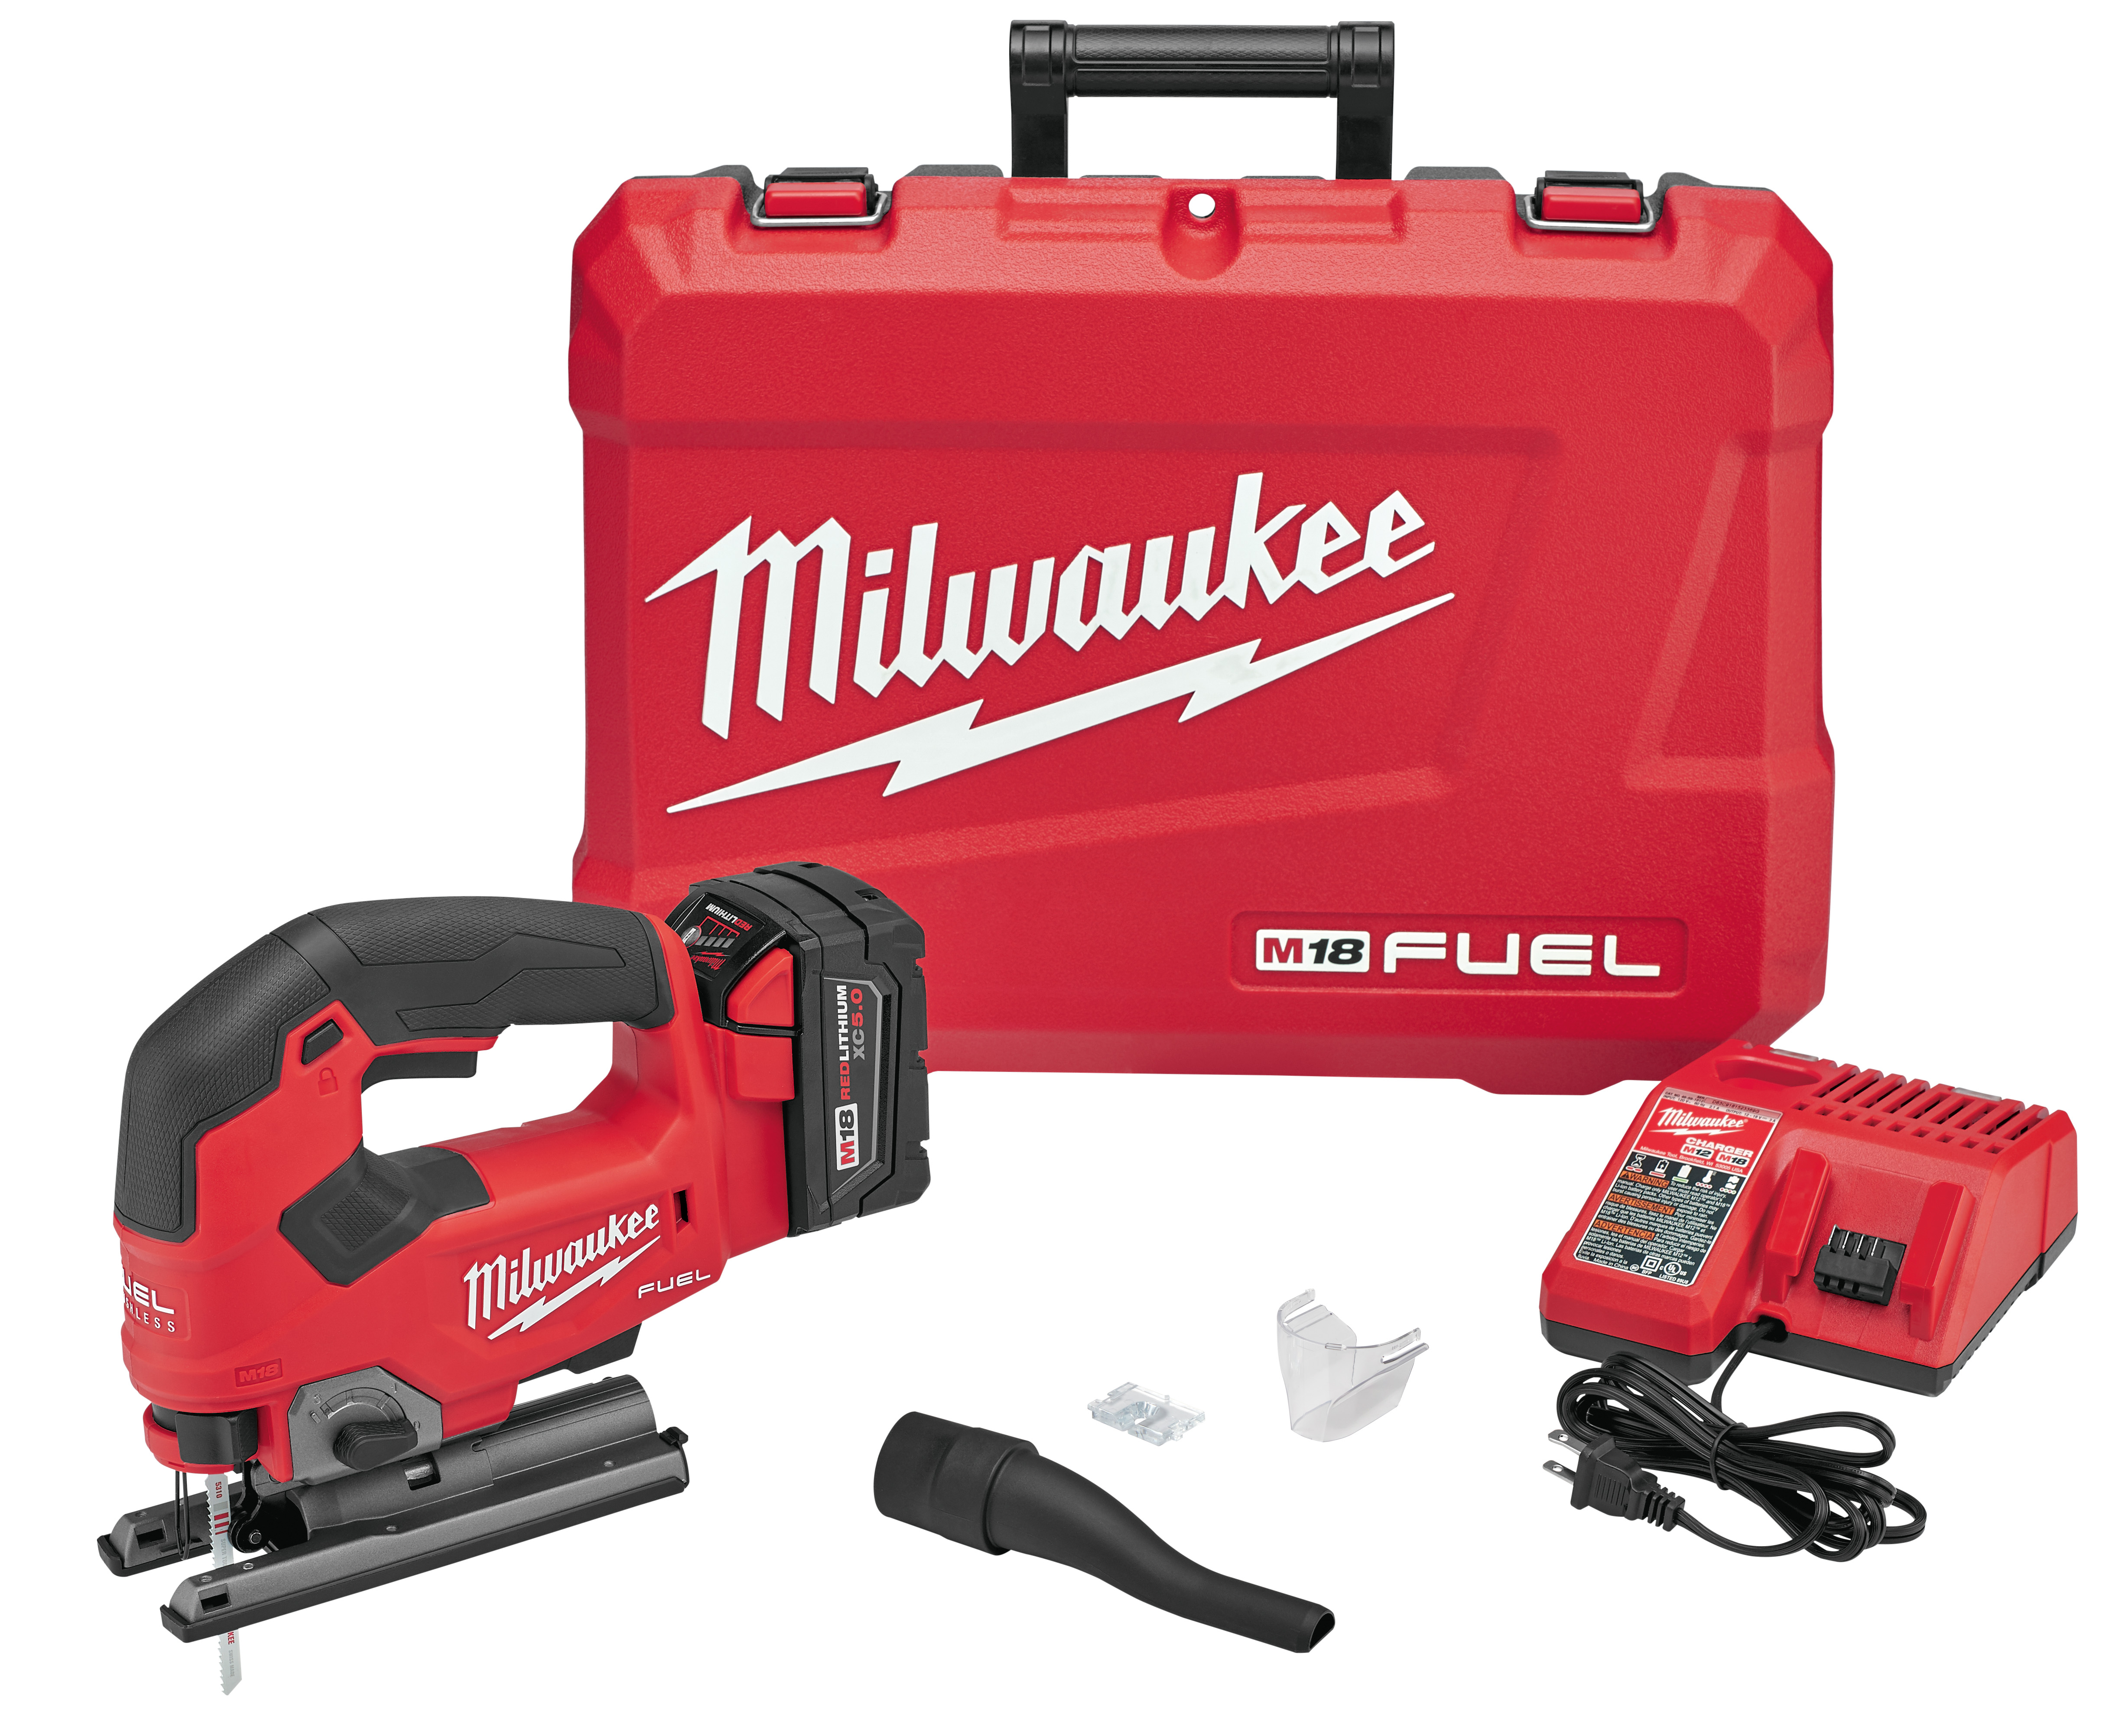 MILW 2737-21 M18 FUEL(TM) D-Handle Jig Saw Kit